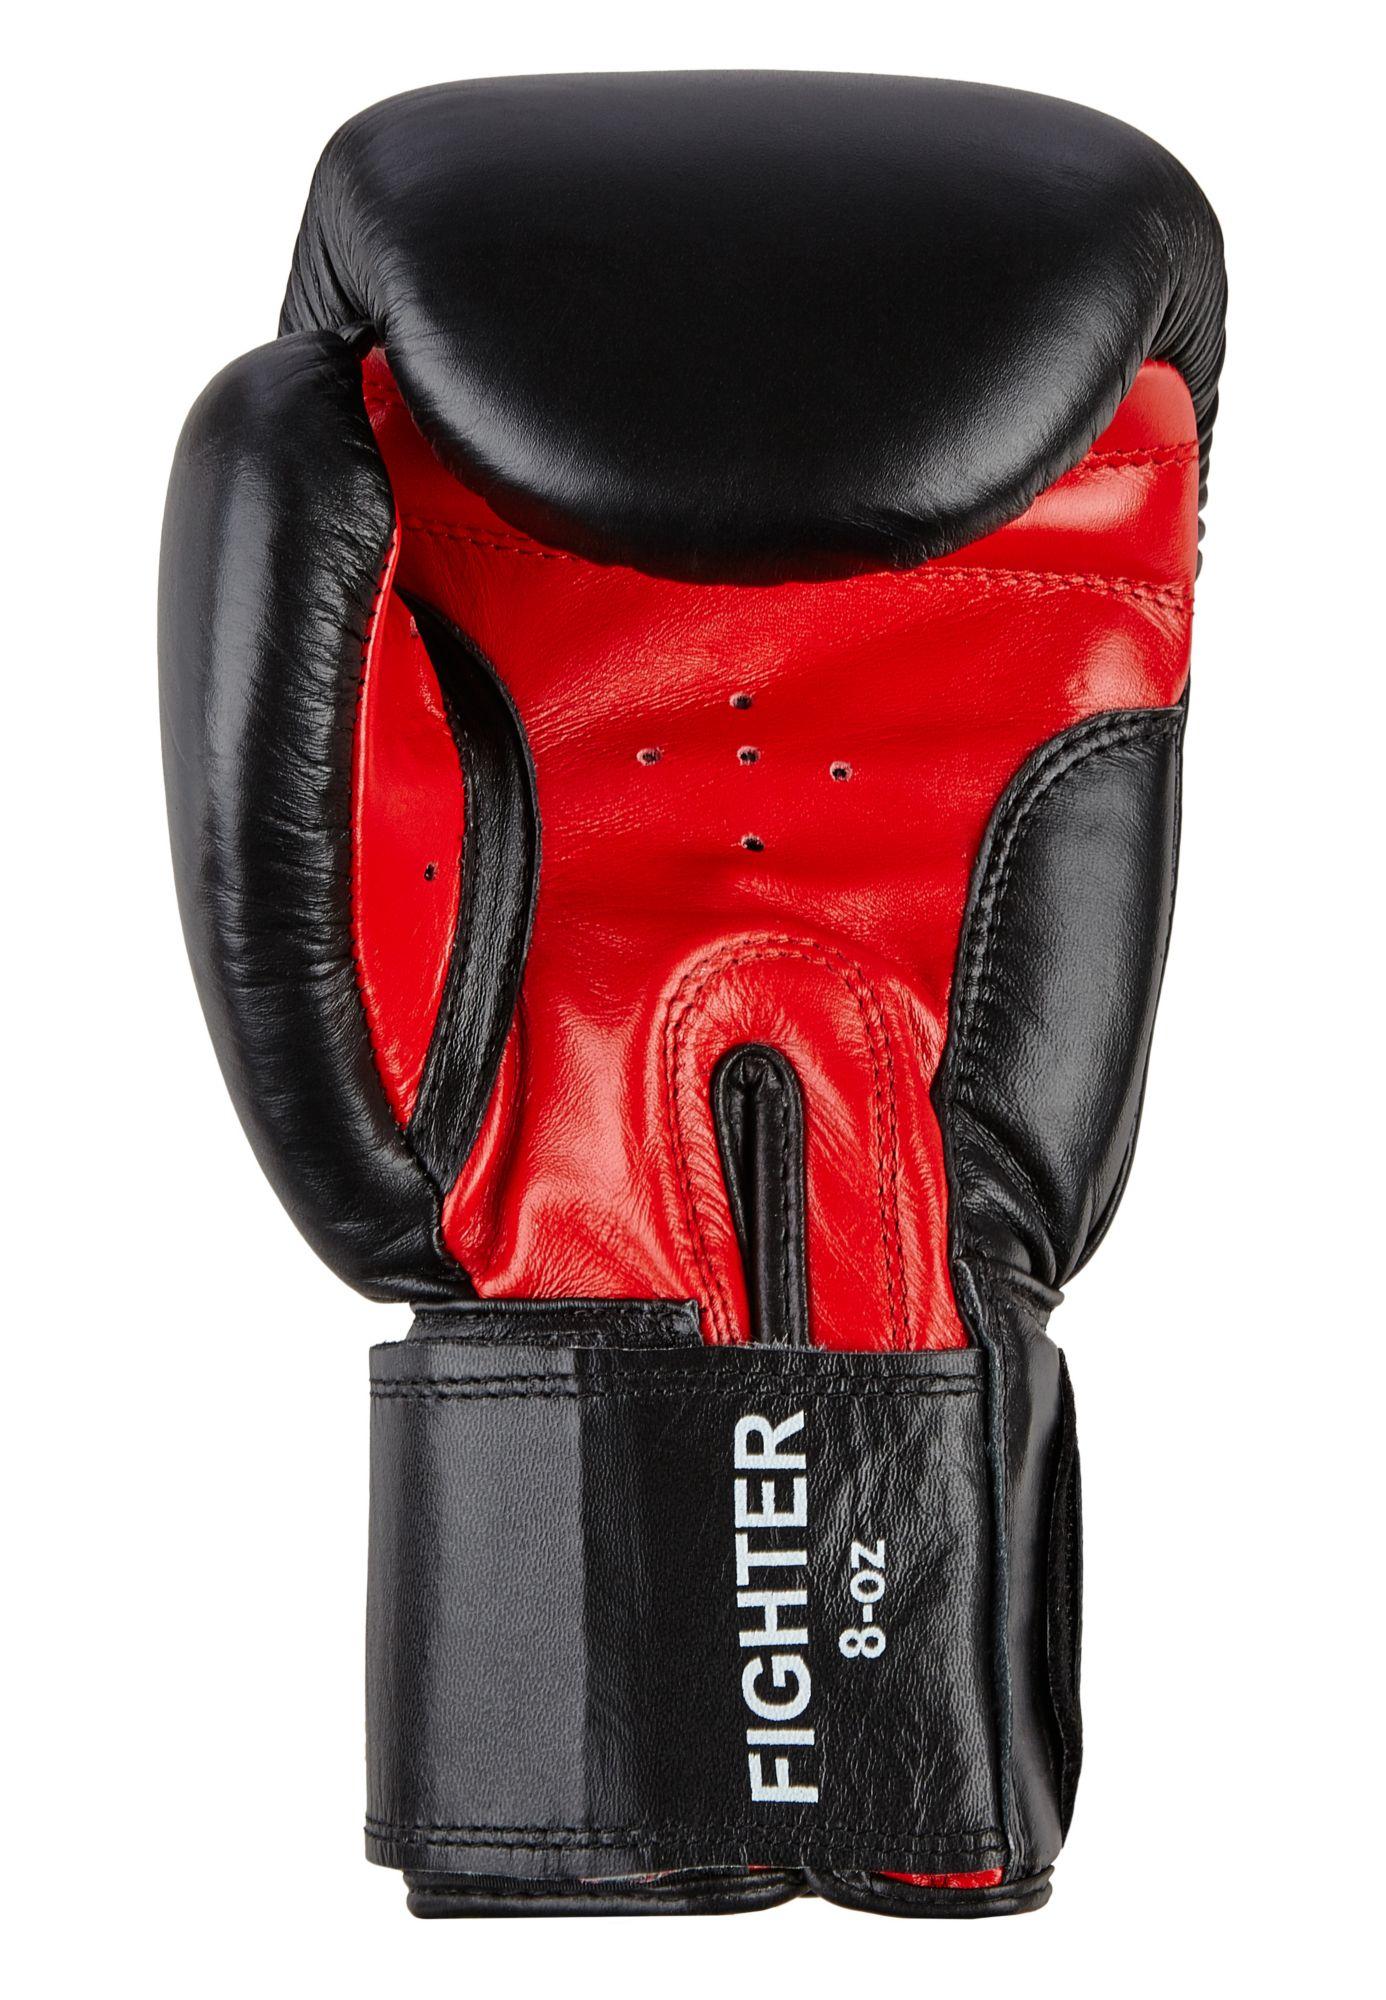 BENLEE ROCKY MARCIANO Benlee Rocky Marciano Boxhandschuhe »FIGHTER«